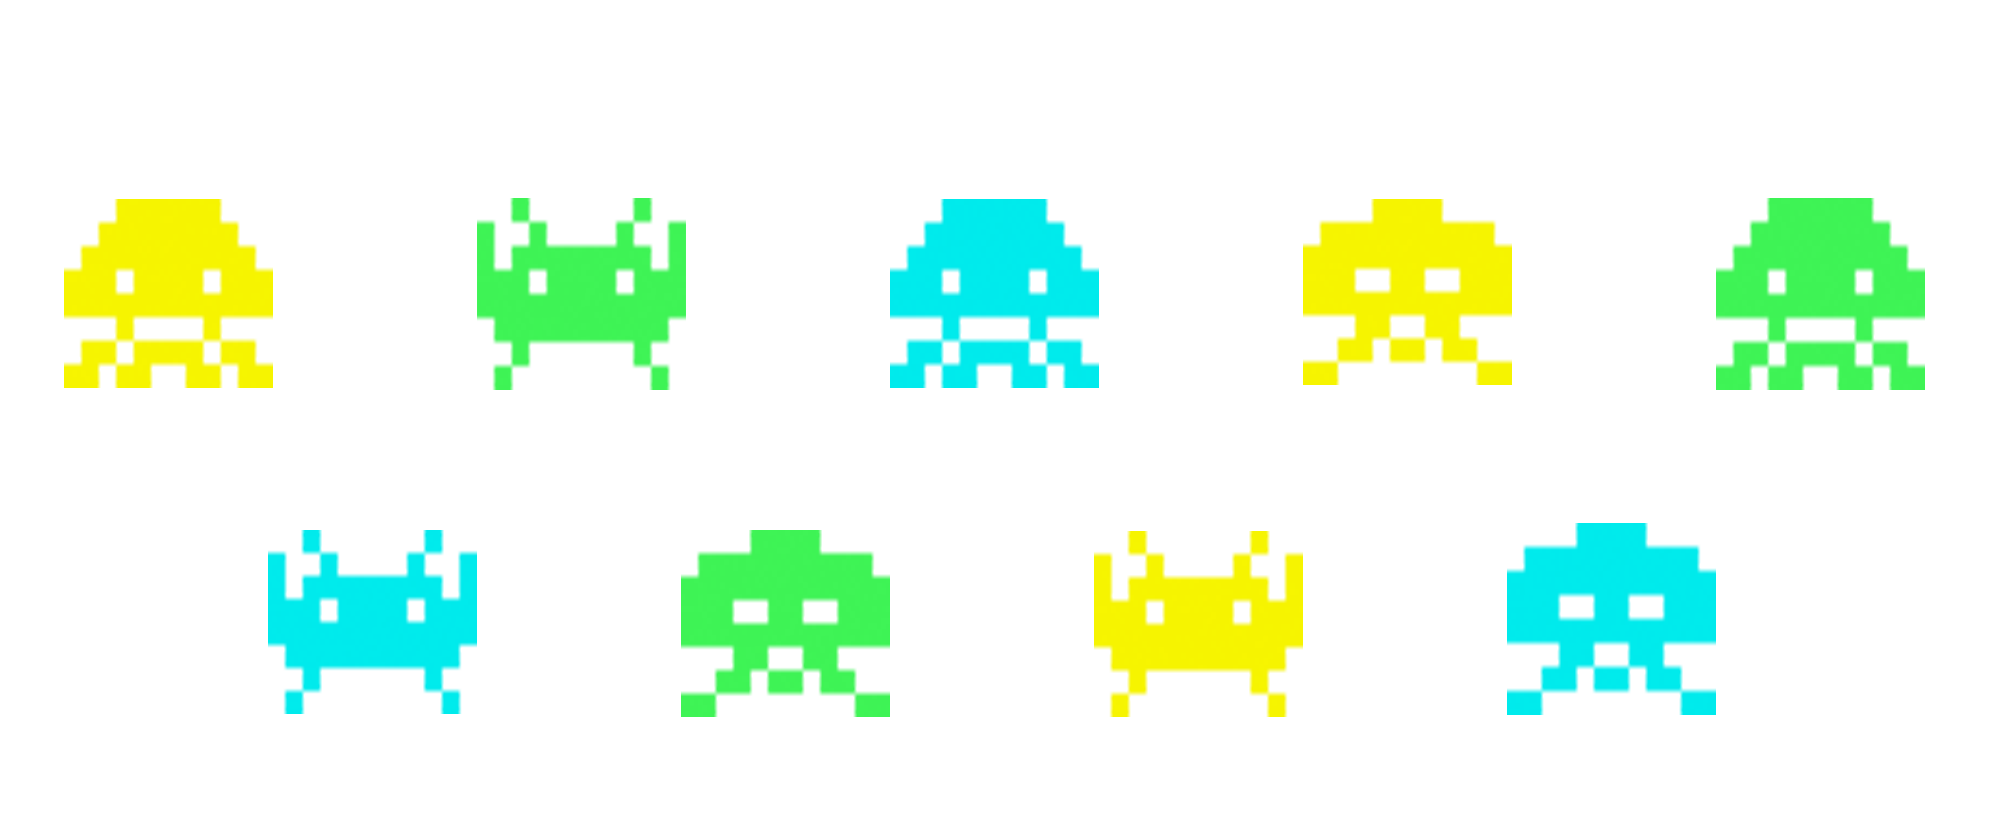 Invader avatars